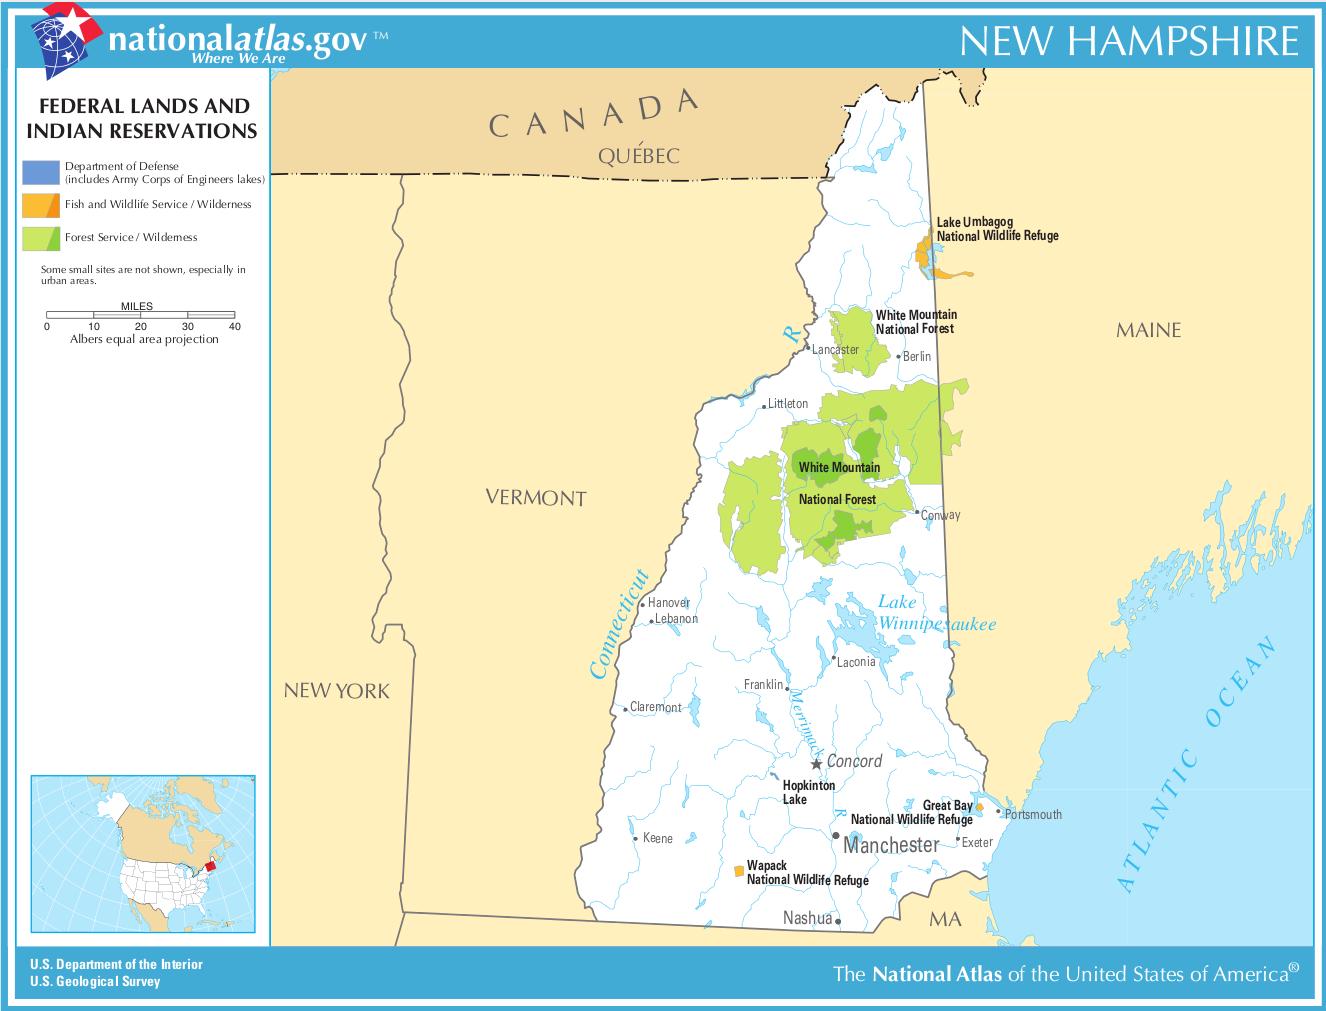 Indianerstamme Nordamerikas Karte.Landkarte New Hampshire Karte Parks Und Indianer Reservate